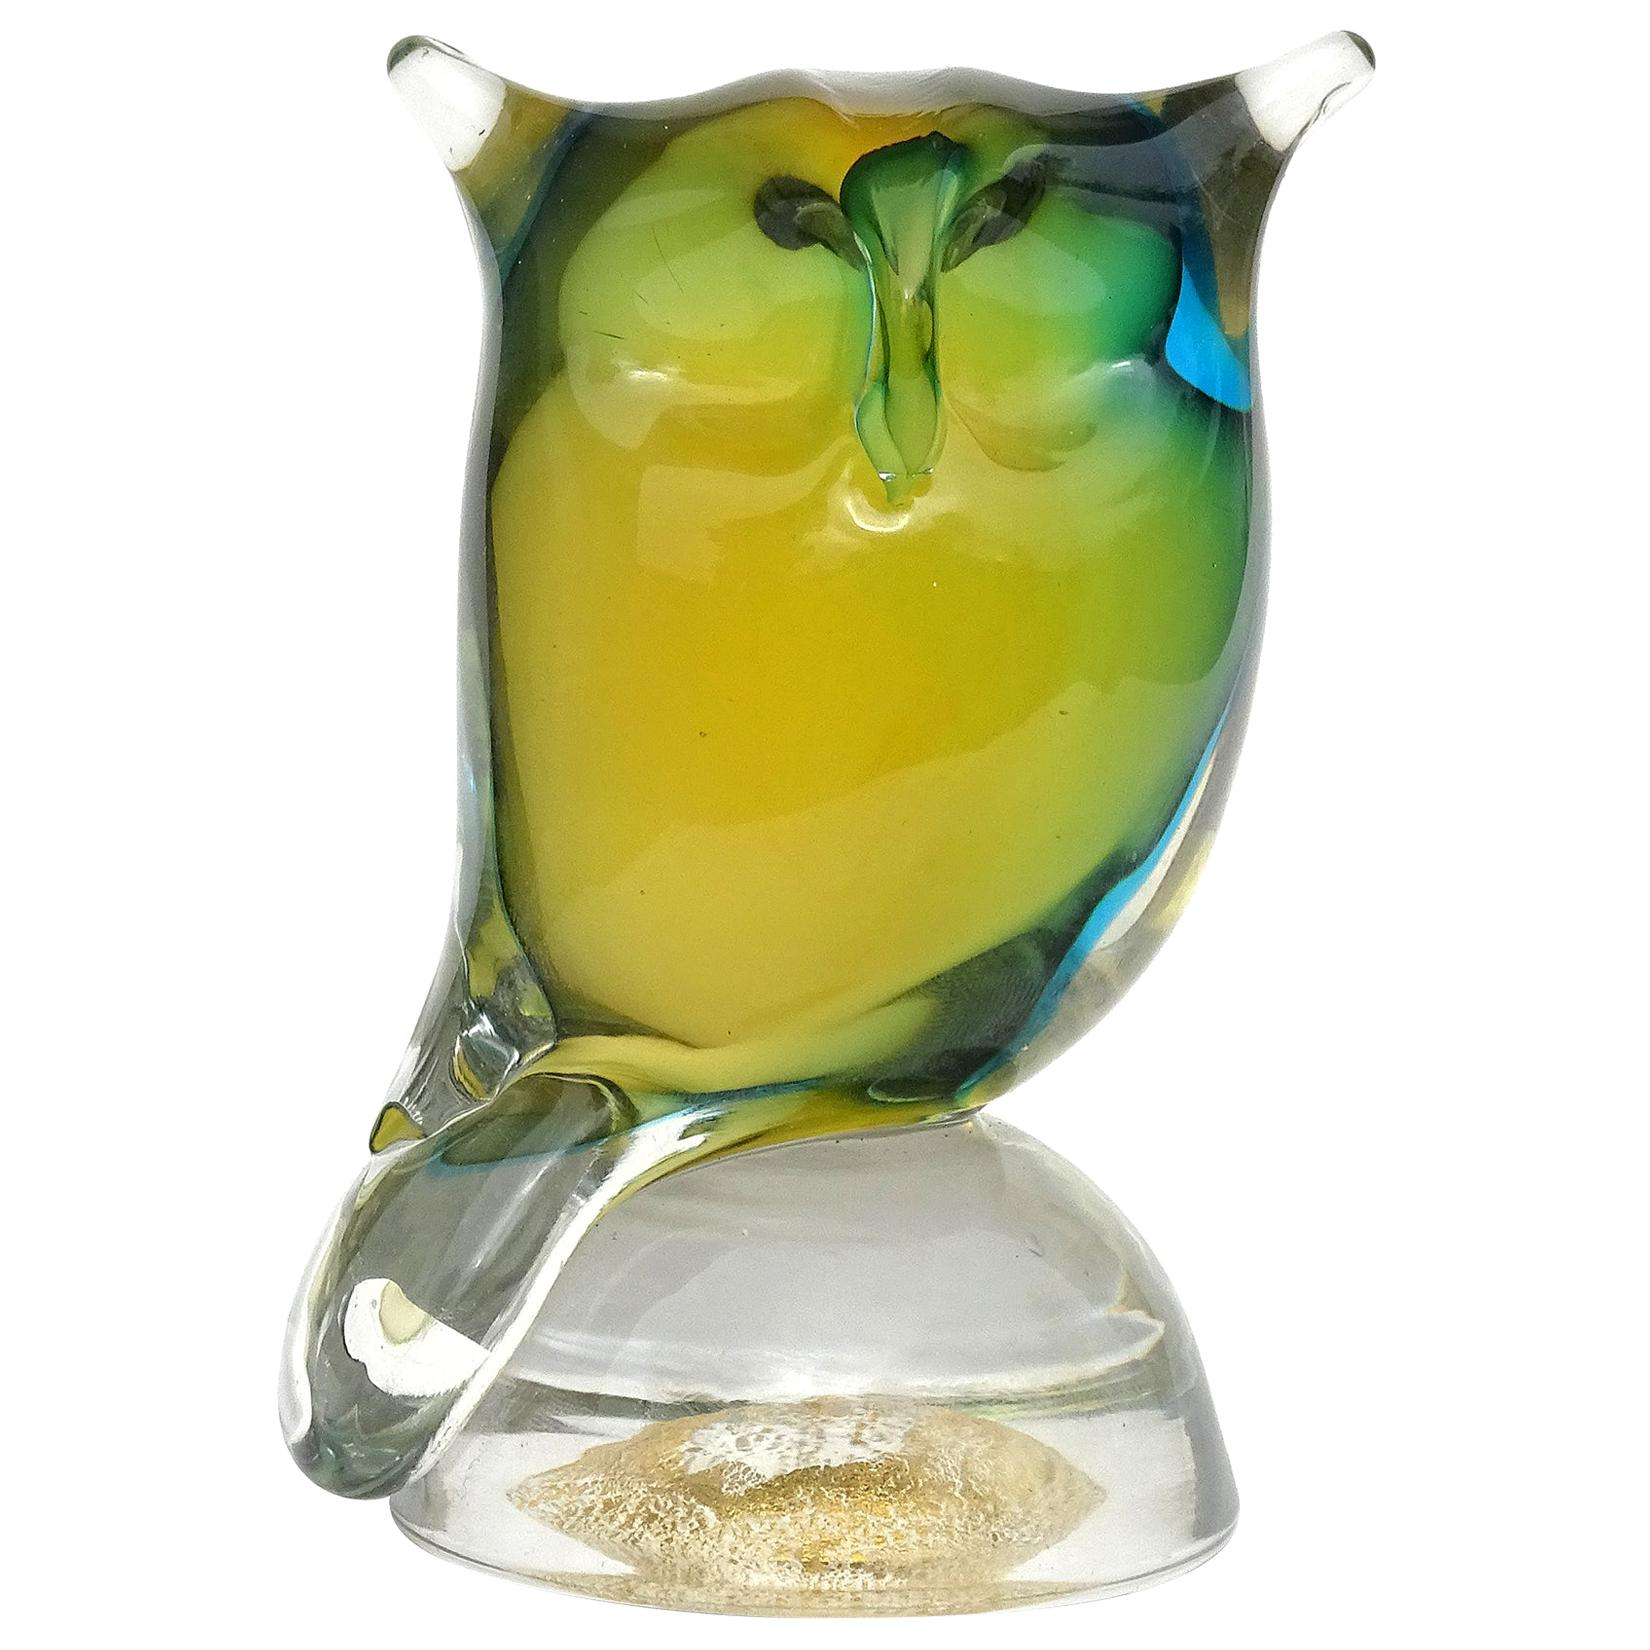 Barbini Murano Yellow Green Blue Sommerso Italian Art Glass Owl Bird Sculpture